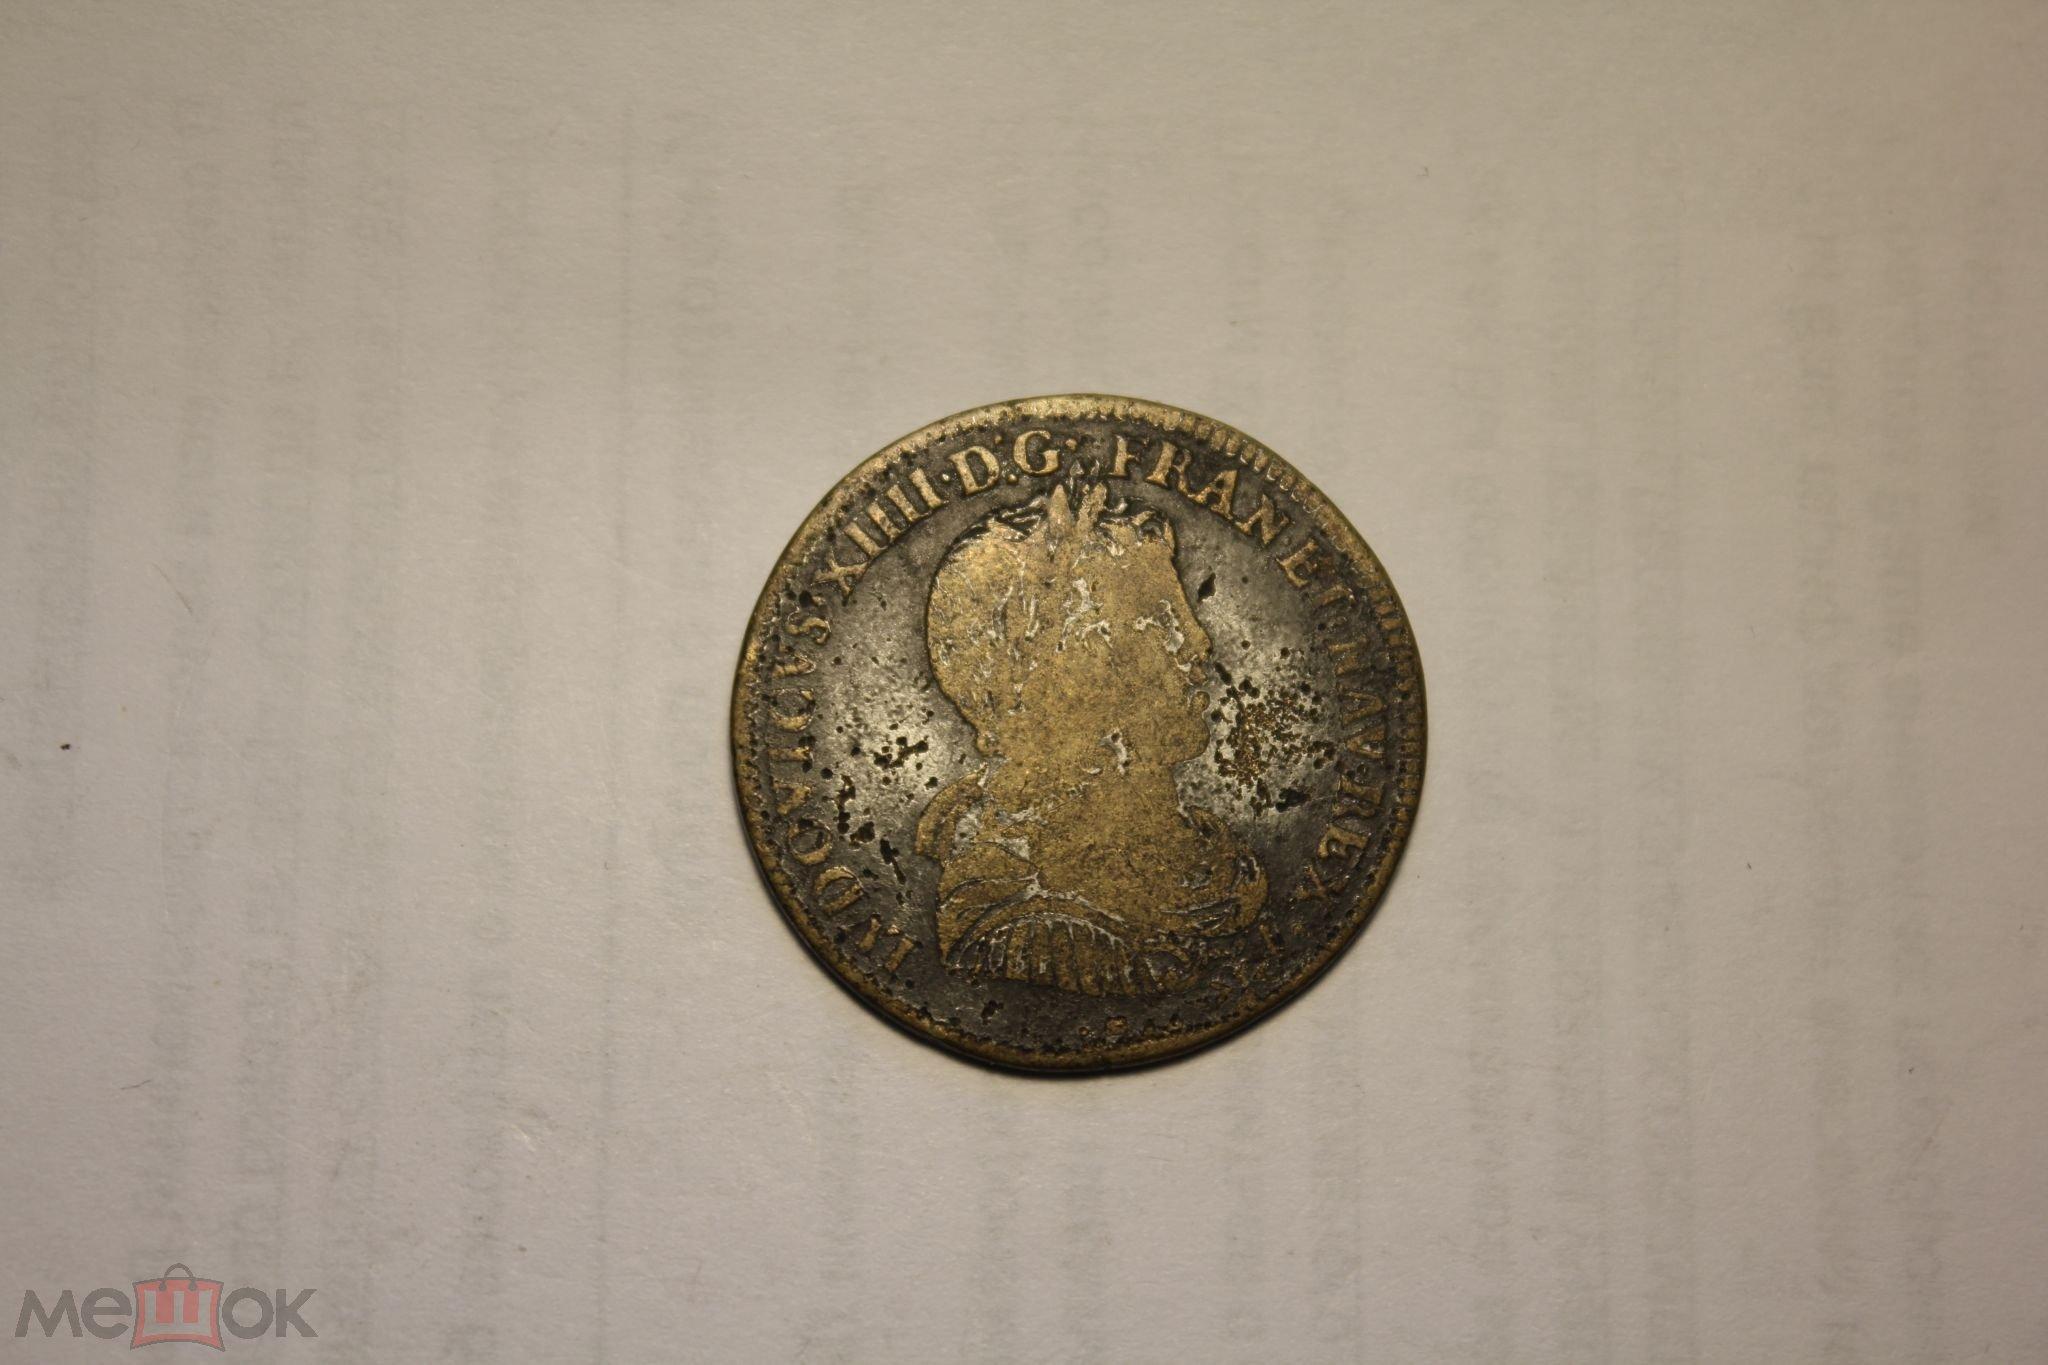 Жетон людовика 16 цена сколько стоит 2 копейки 1914 года цена